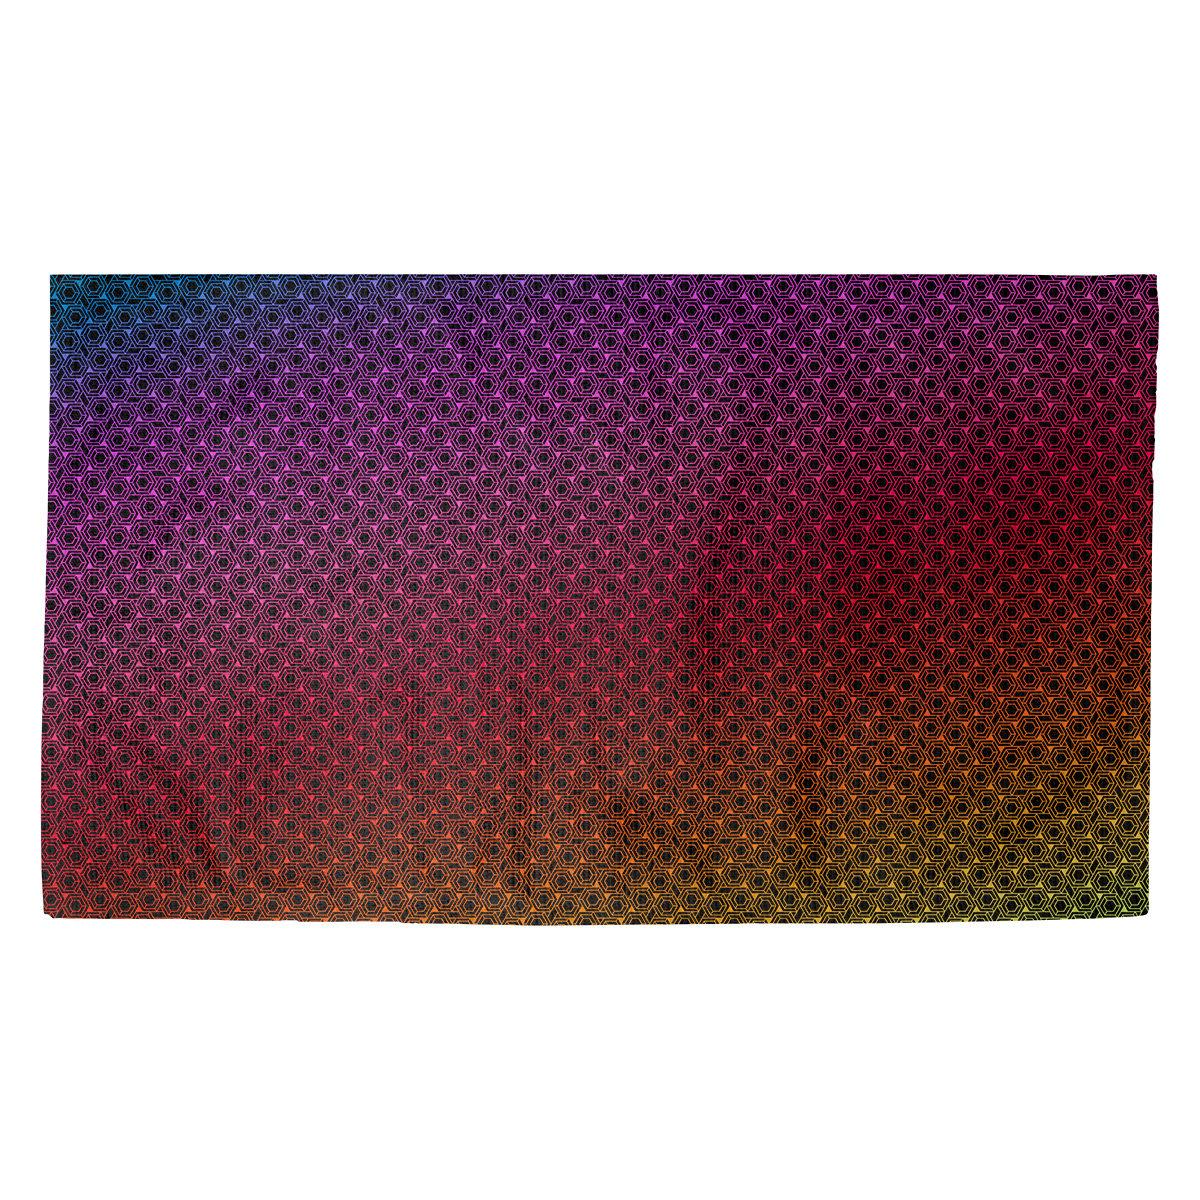 Latitude Run Avicia Hexagonal Lattice Dark Purple Area Rug Wayfair